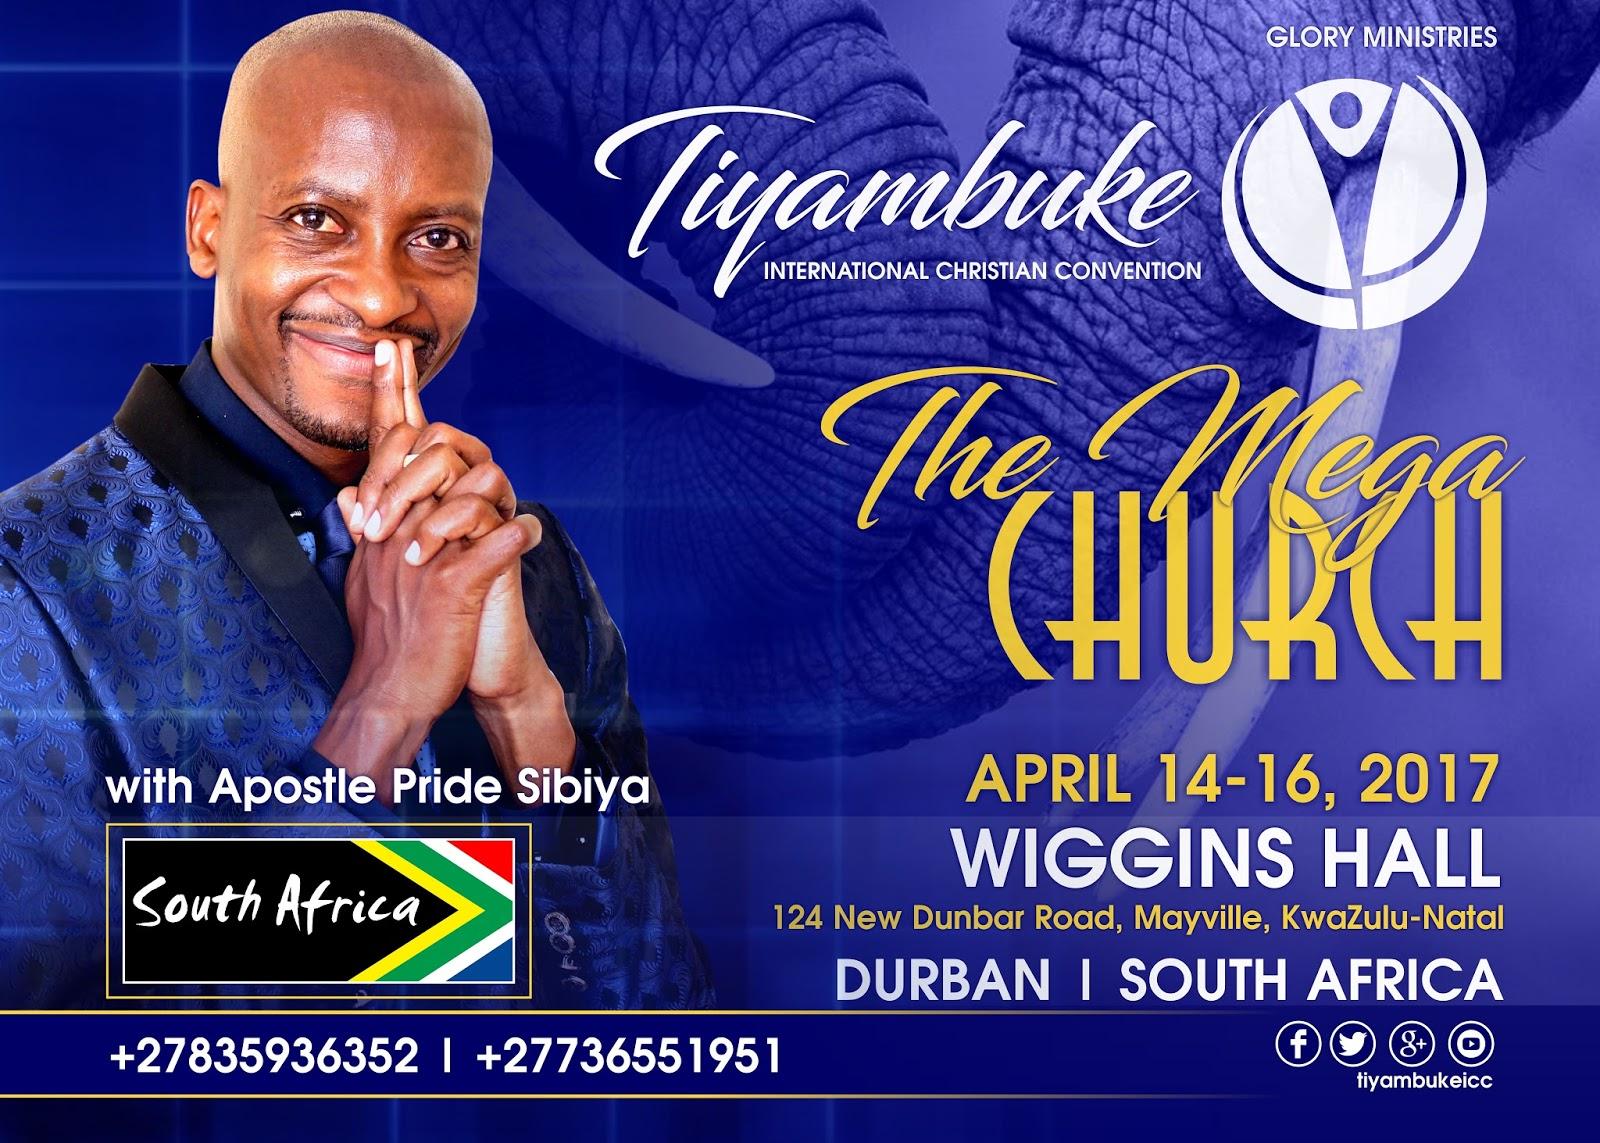 Meme and Banners for Mzansi Tiyambuke 2017 with Apostle Pride Sibiya